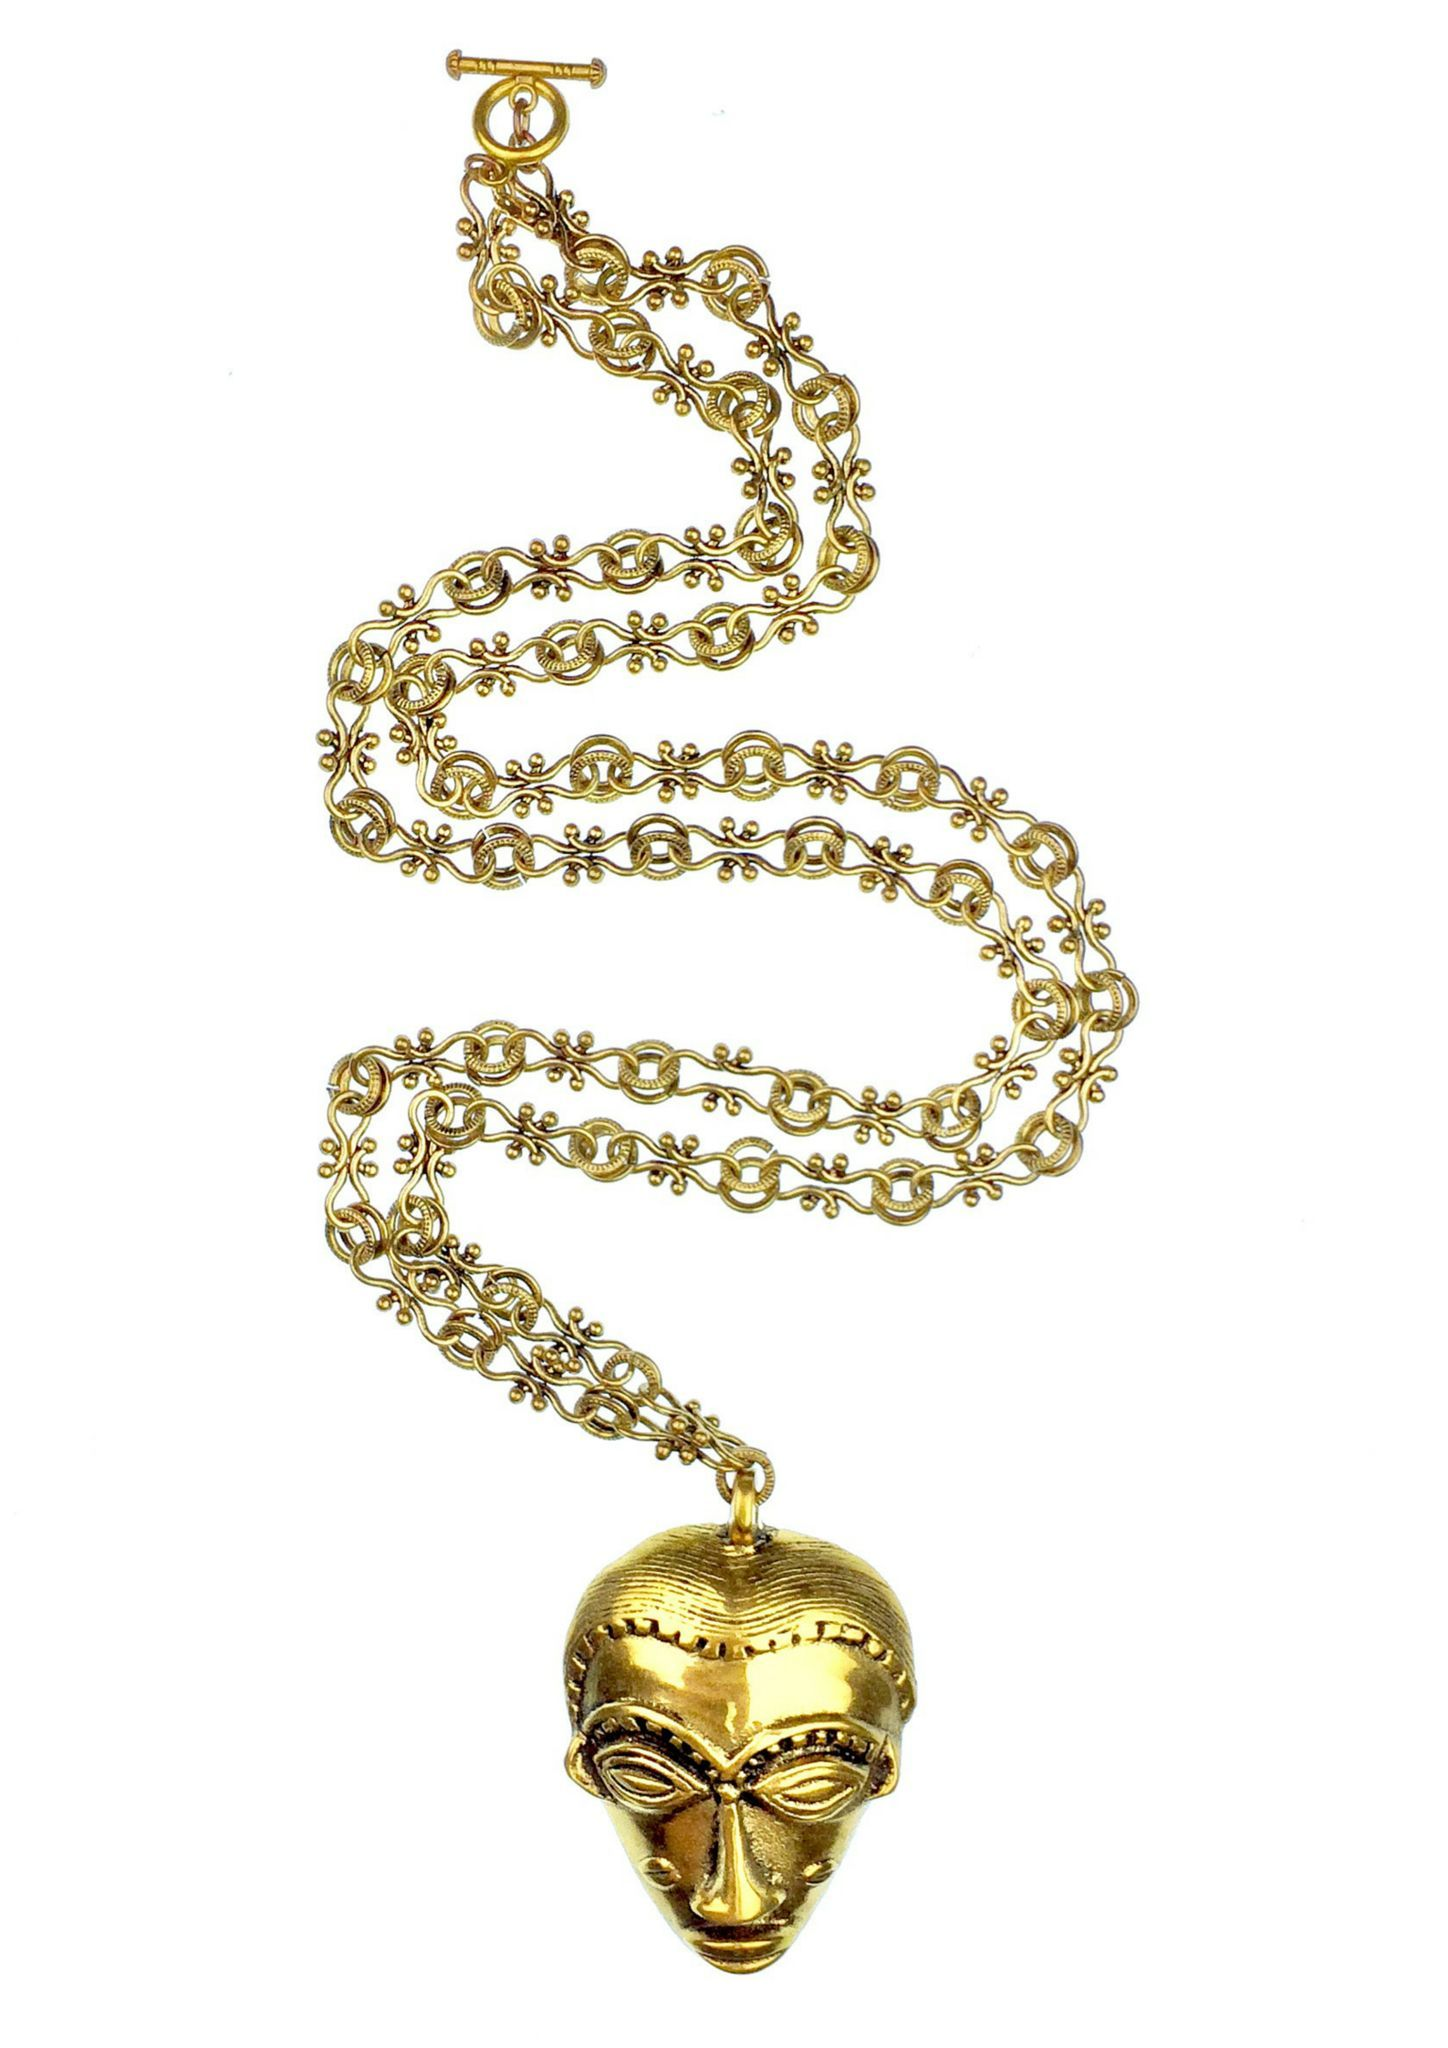 Congo Bongo Necklace Necklaces JARED JAMIN Jared Jamin jewelry